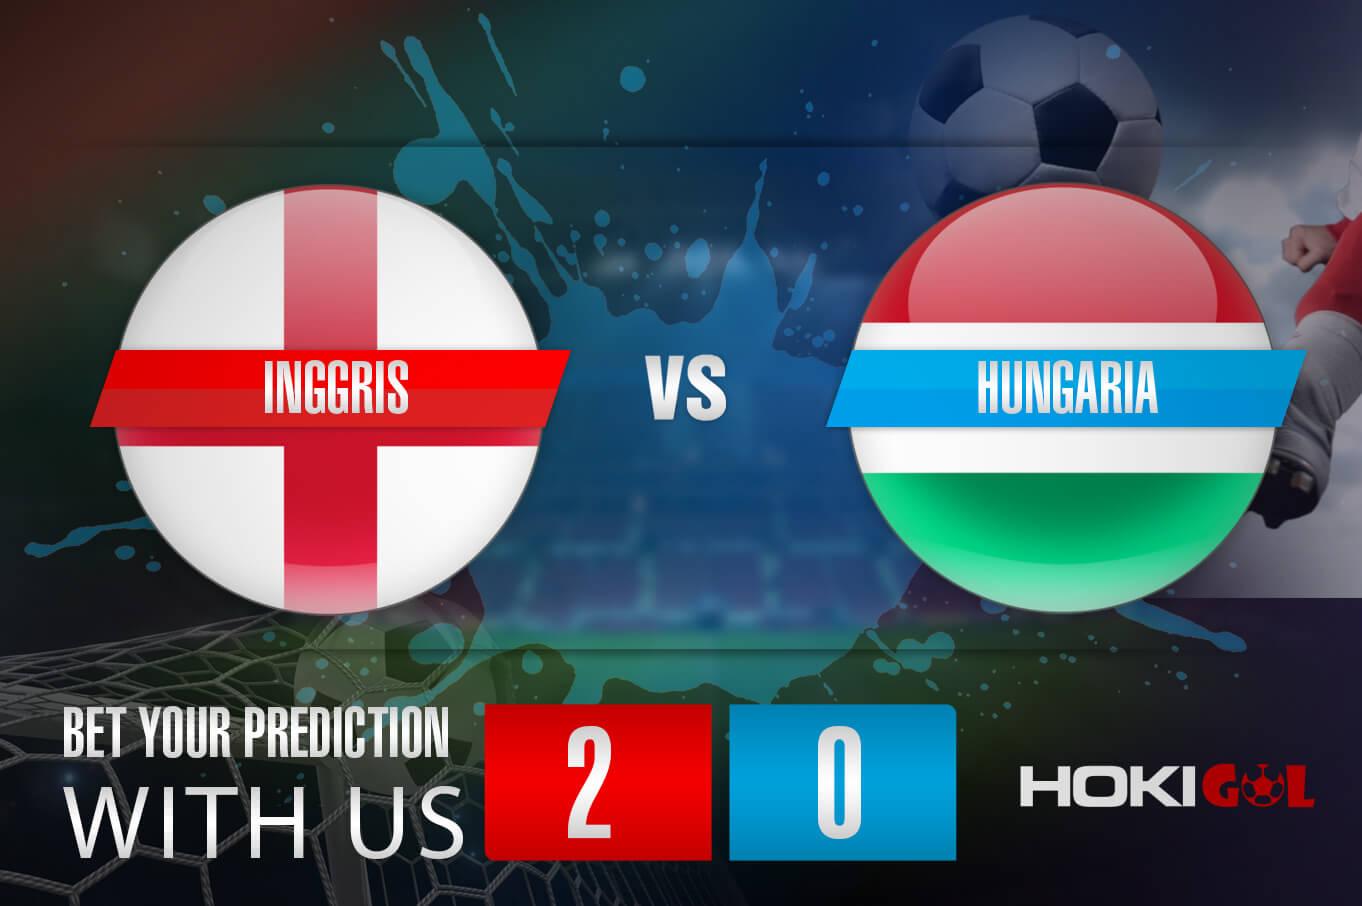 Prediksi Bola Inggris Vs Hungaria 13 Oktober 2021